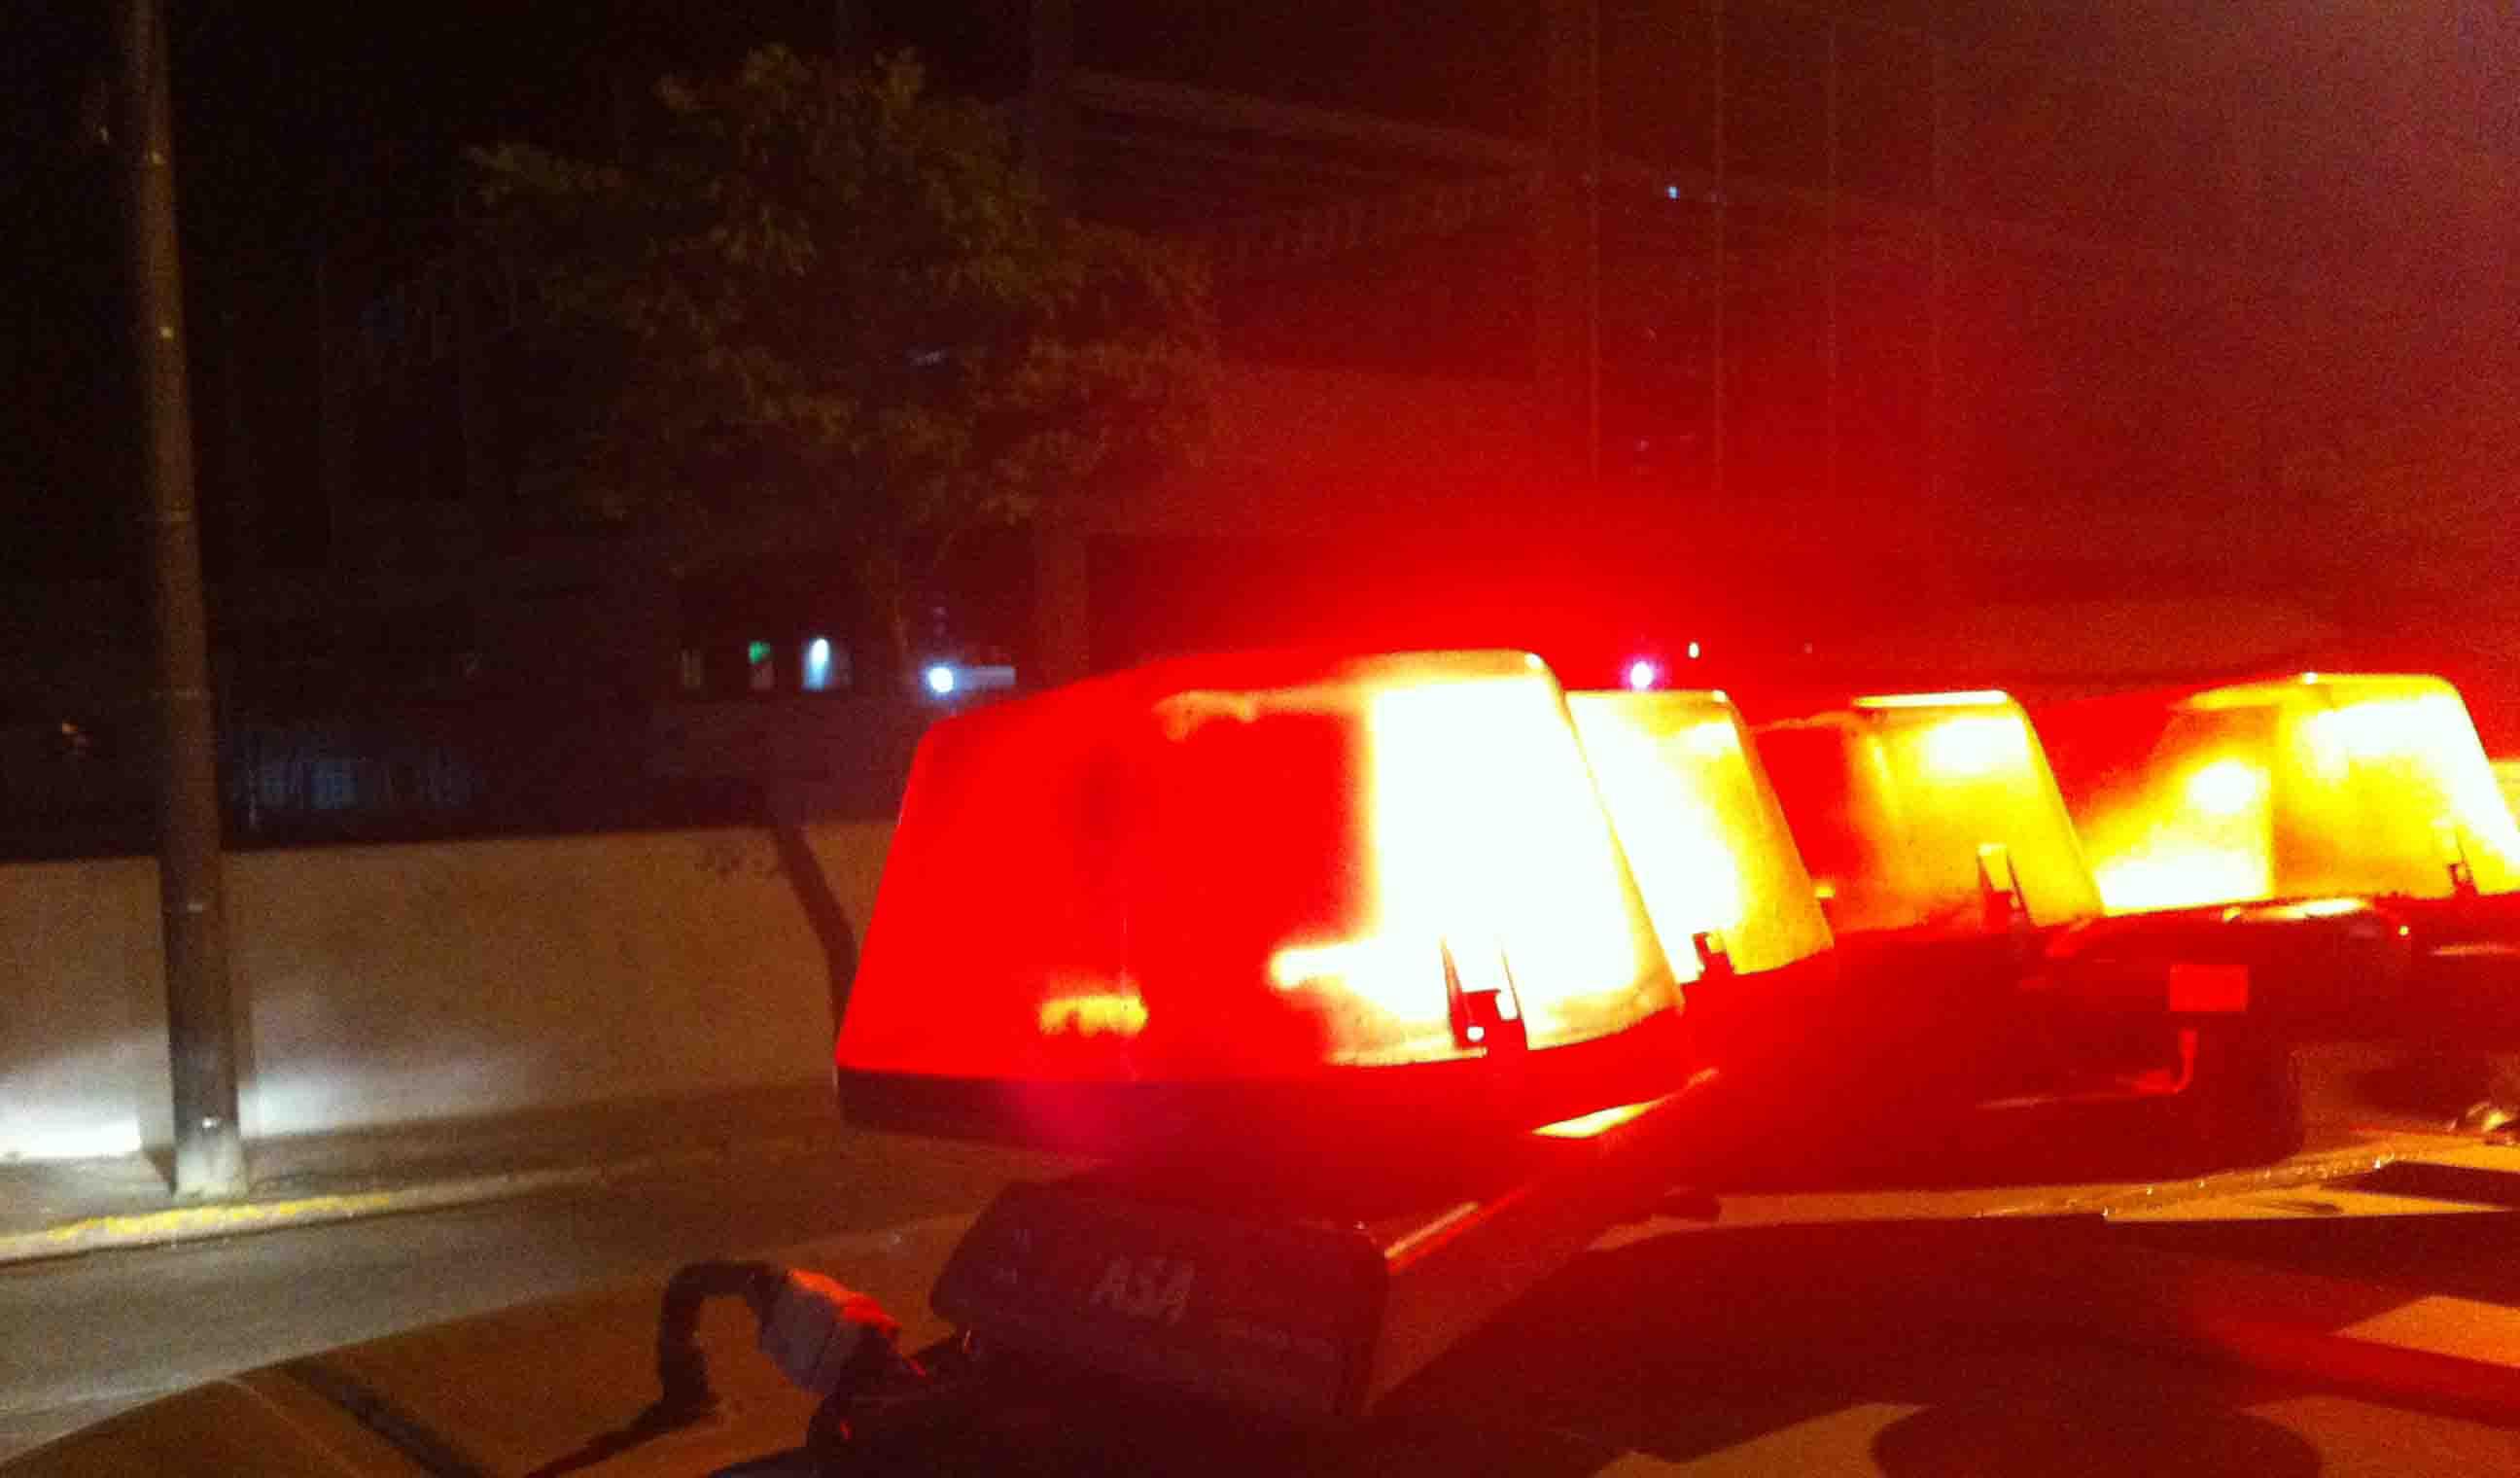 policia-sirene - TANGARÁ EM FOCO